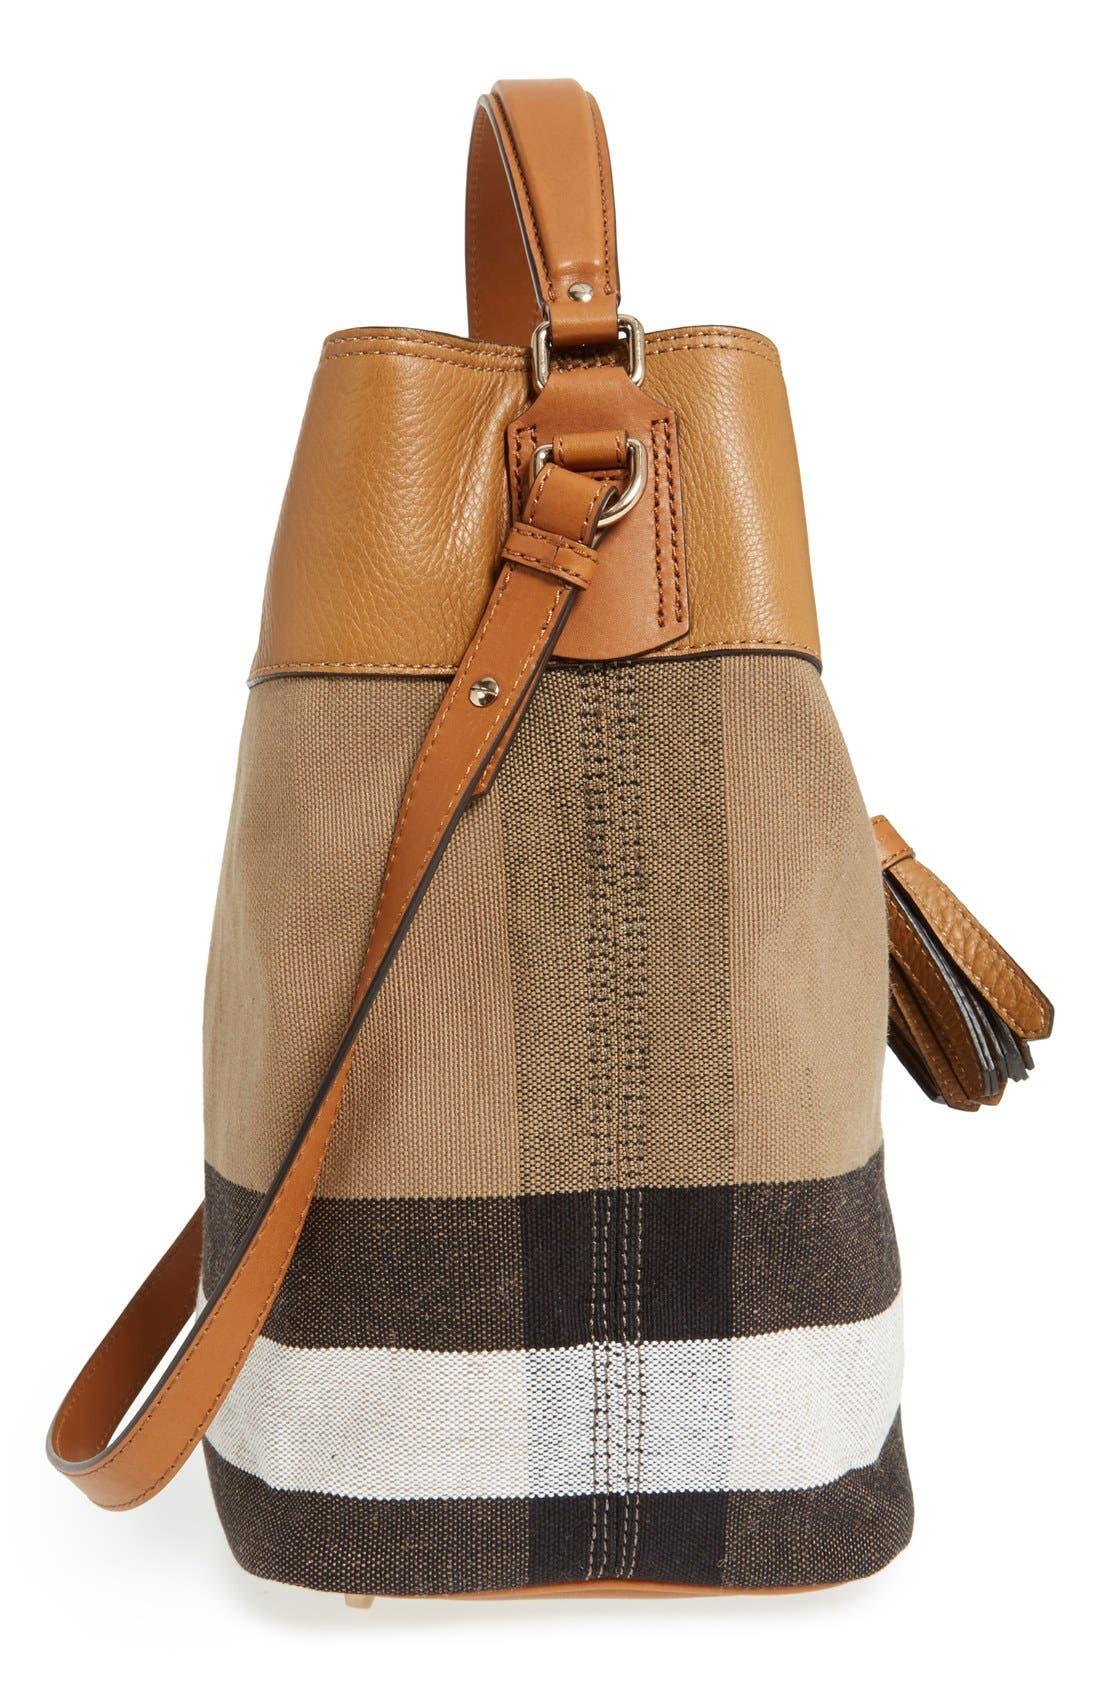 BURBERRY,                             Medium Ashby Bucket Bag,                             Alternate thumbnail 4, color,                             200